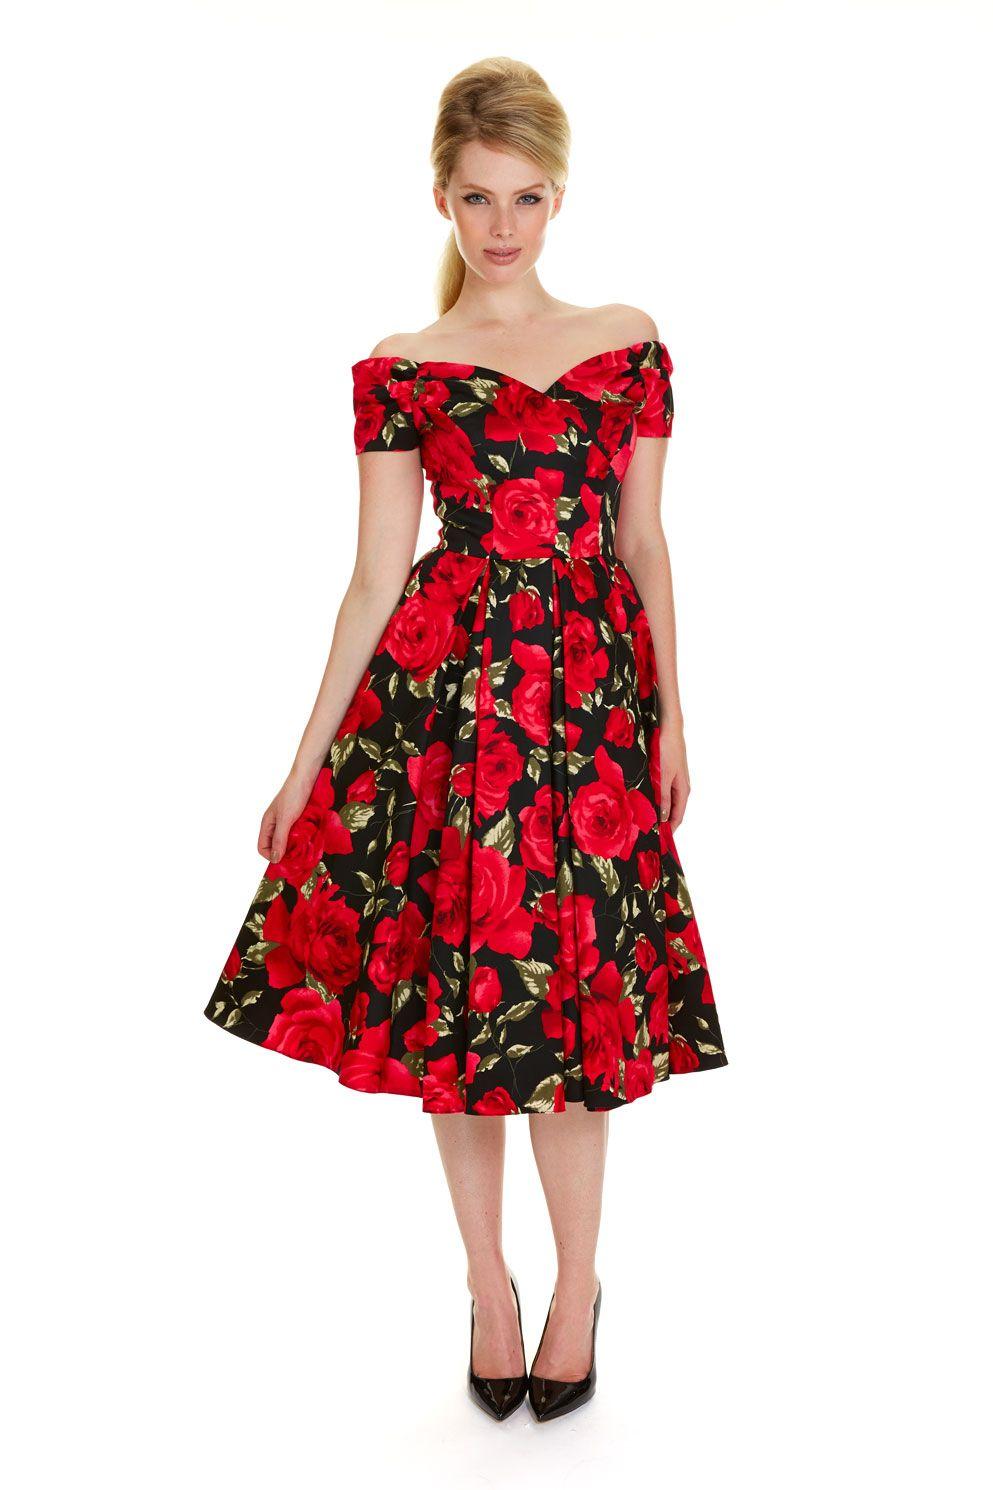 Fatale black u red sorrento prom dress view fashion and beauty